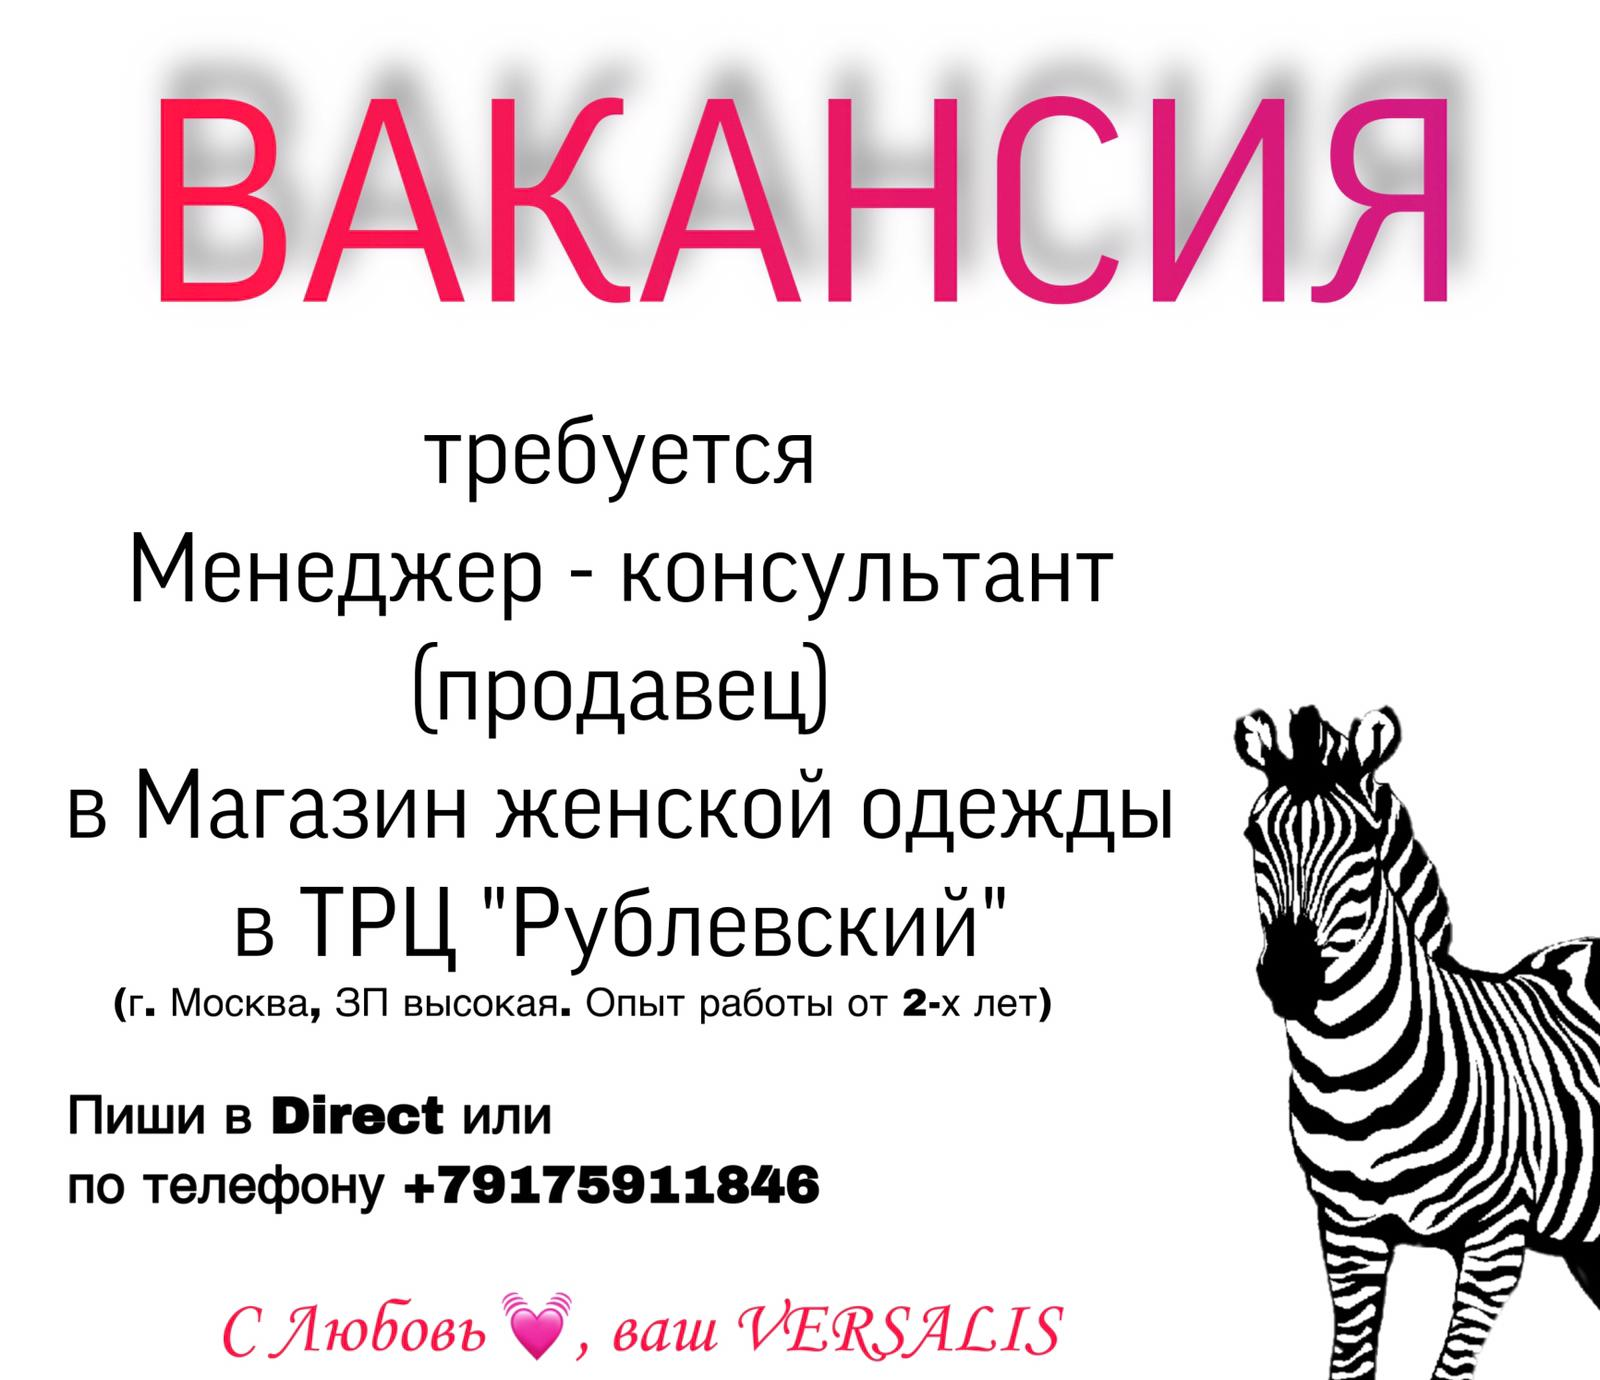 whatsapp image 2020 08 15 at 20.33.27 - Вакансия менеджера-консультанта